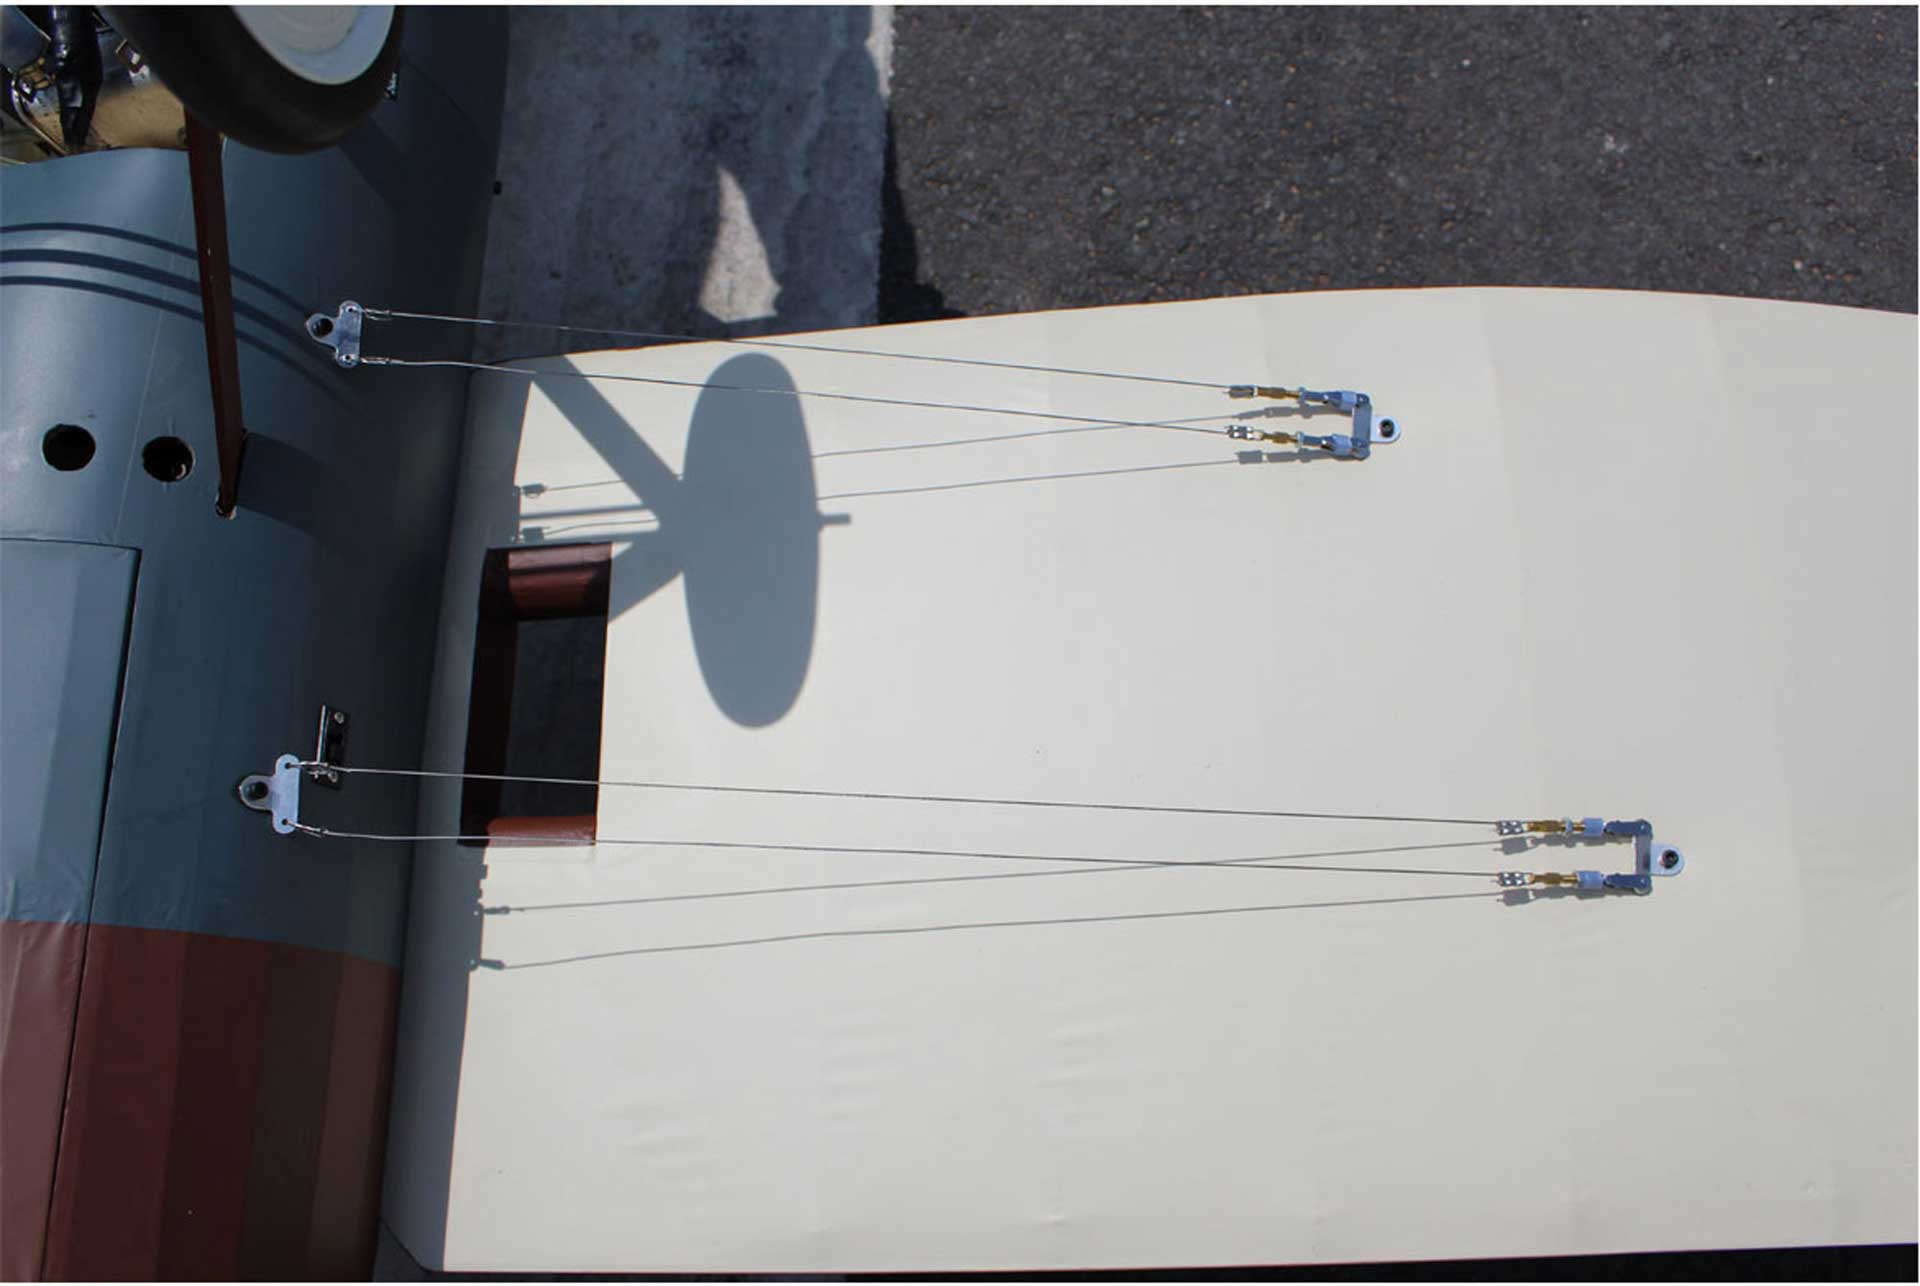 "Seagull Models ( SG-Models ) BRISTOL M1C MONOPLANES SPANS 1,8M ARF 71"" 1:4"